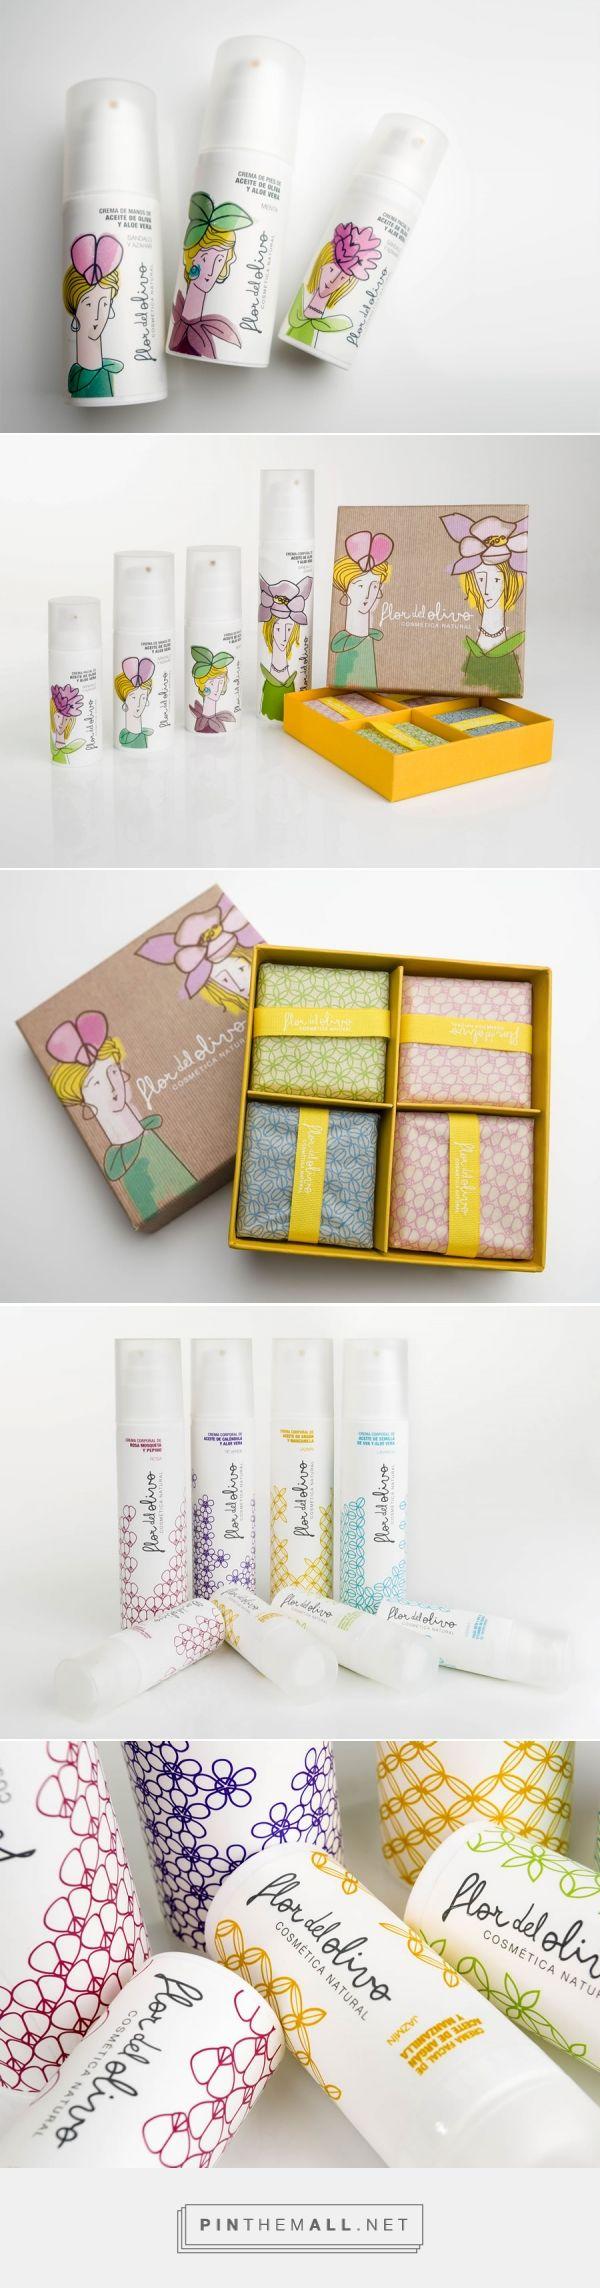 Natural cosmetics / isabelcabello